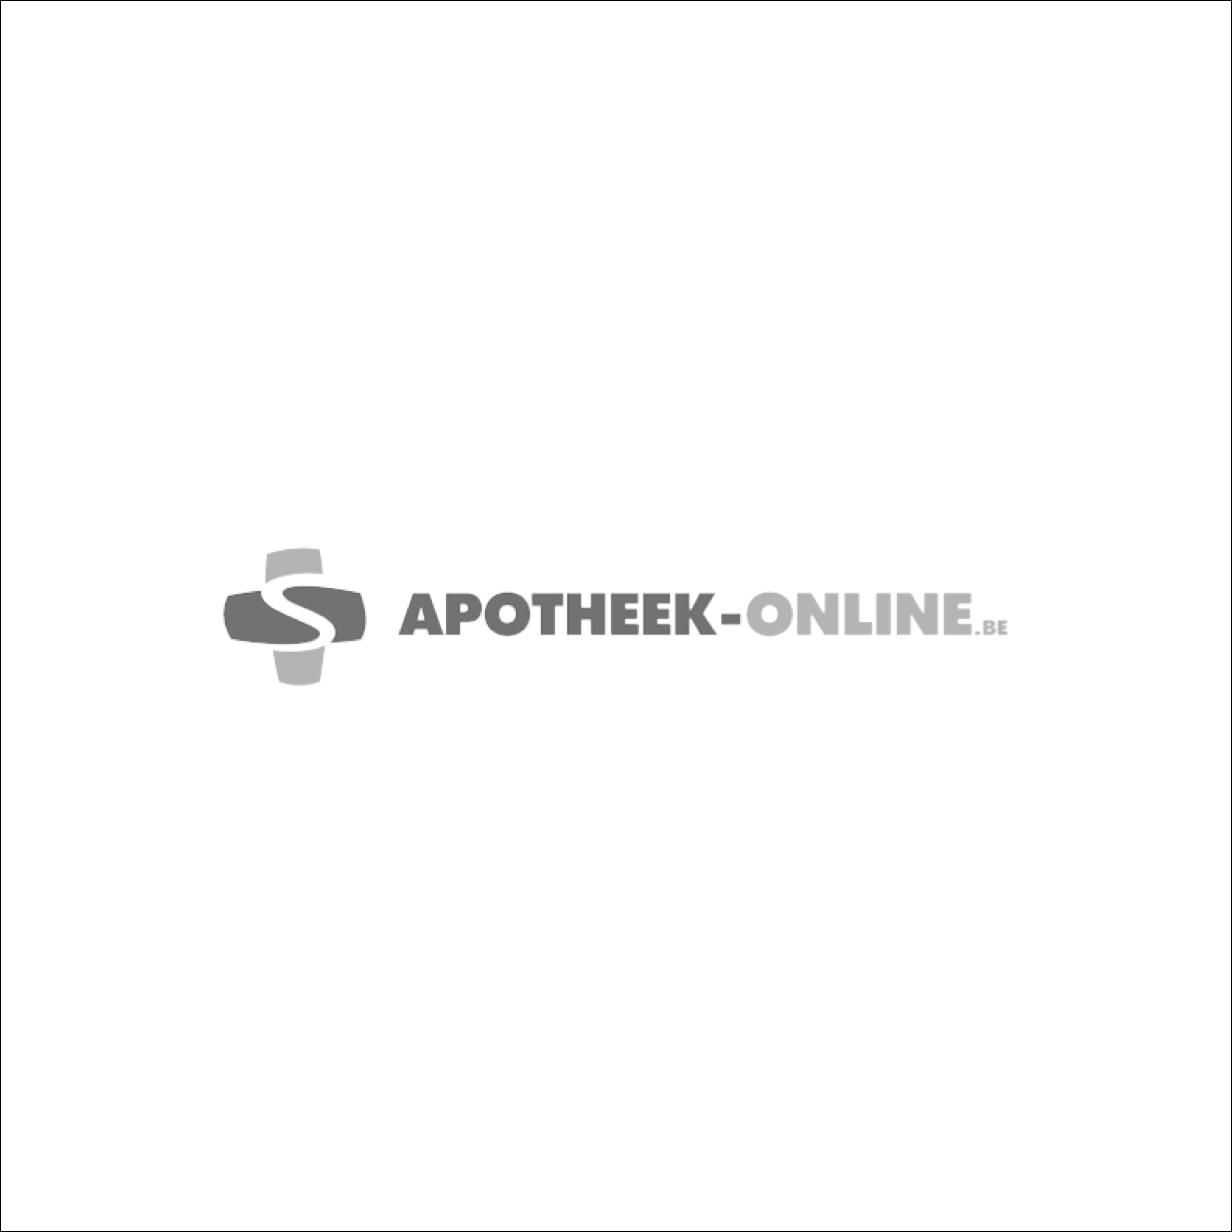 Norlevo 1,5mg Contraception d'Urgence 1 Comprimé